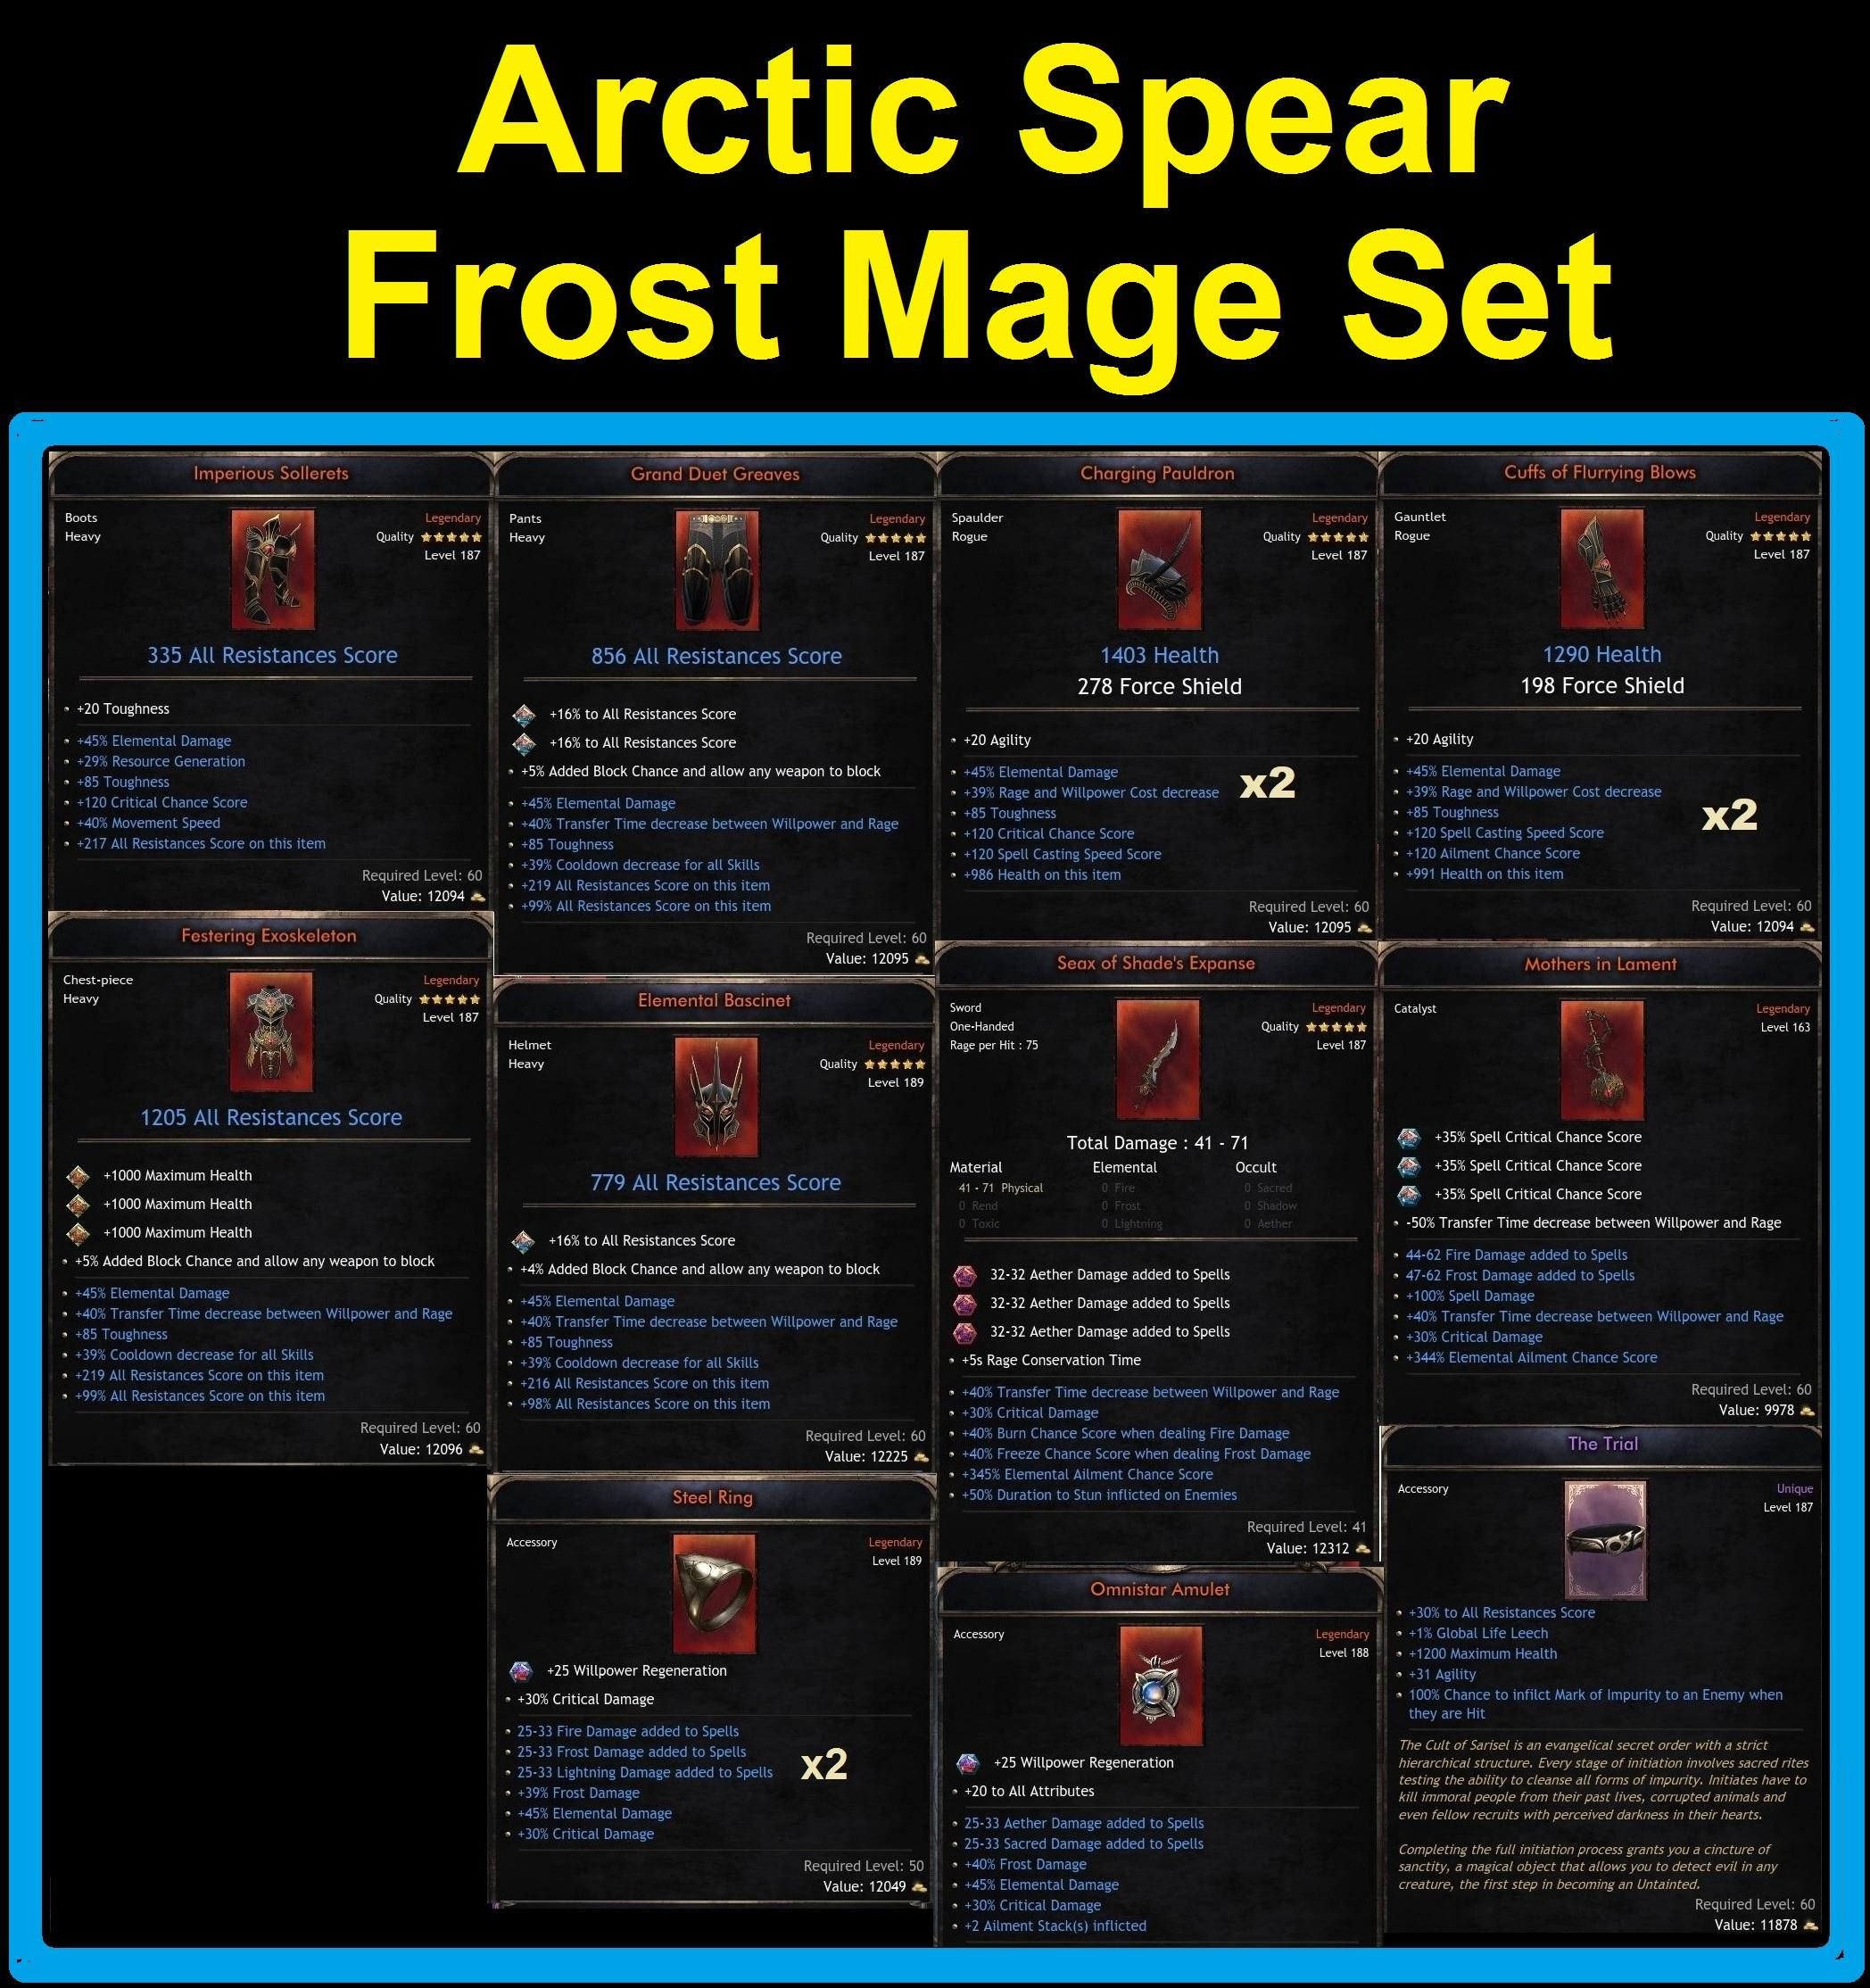 Arctic Spear Frost Mage Set | Max Rolls +45% Elemental Damage | 14 Items | 30% Trial Belt + Gold